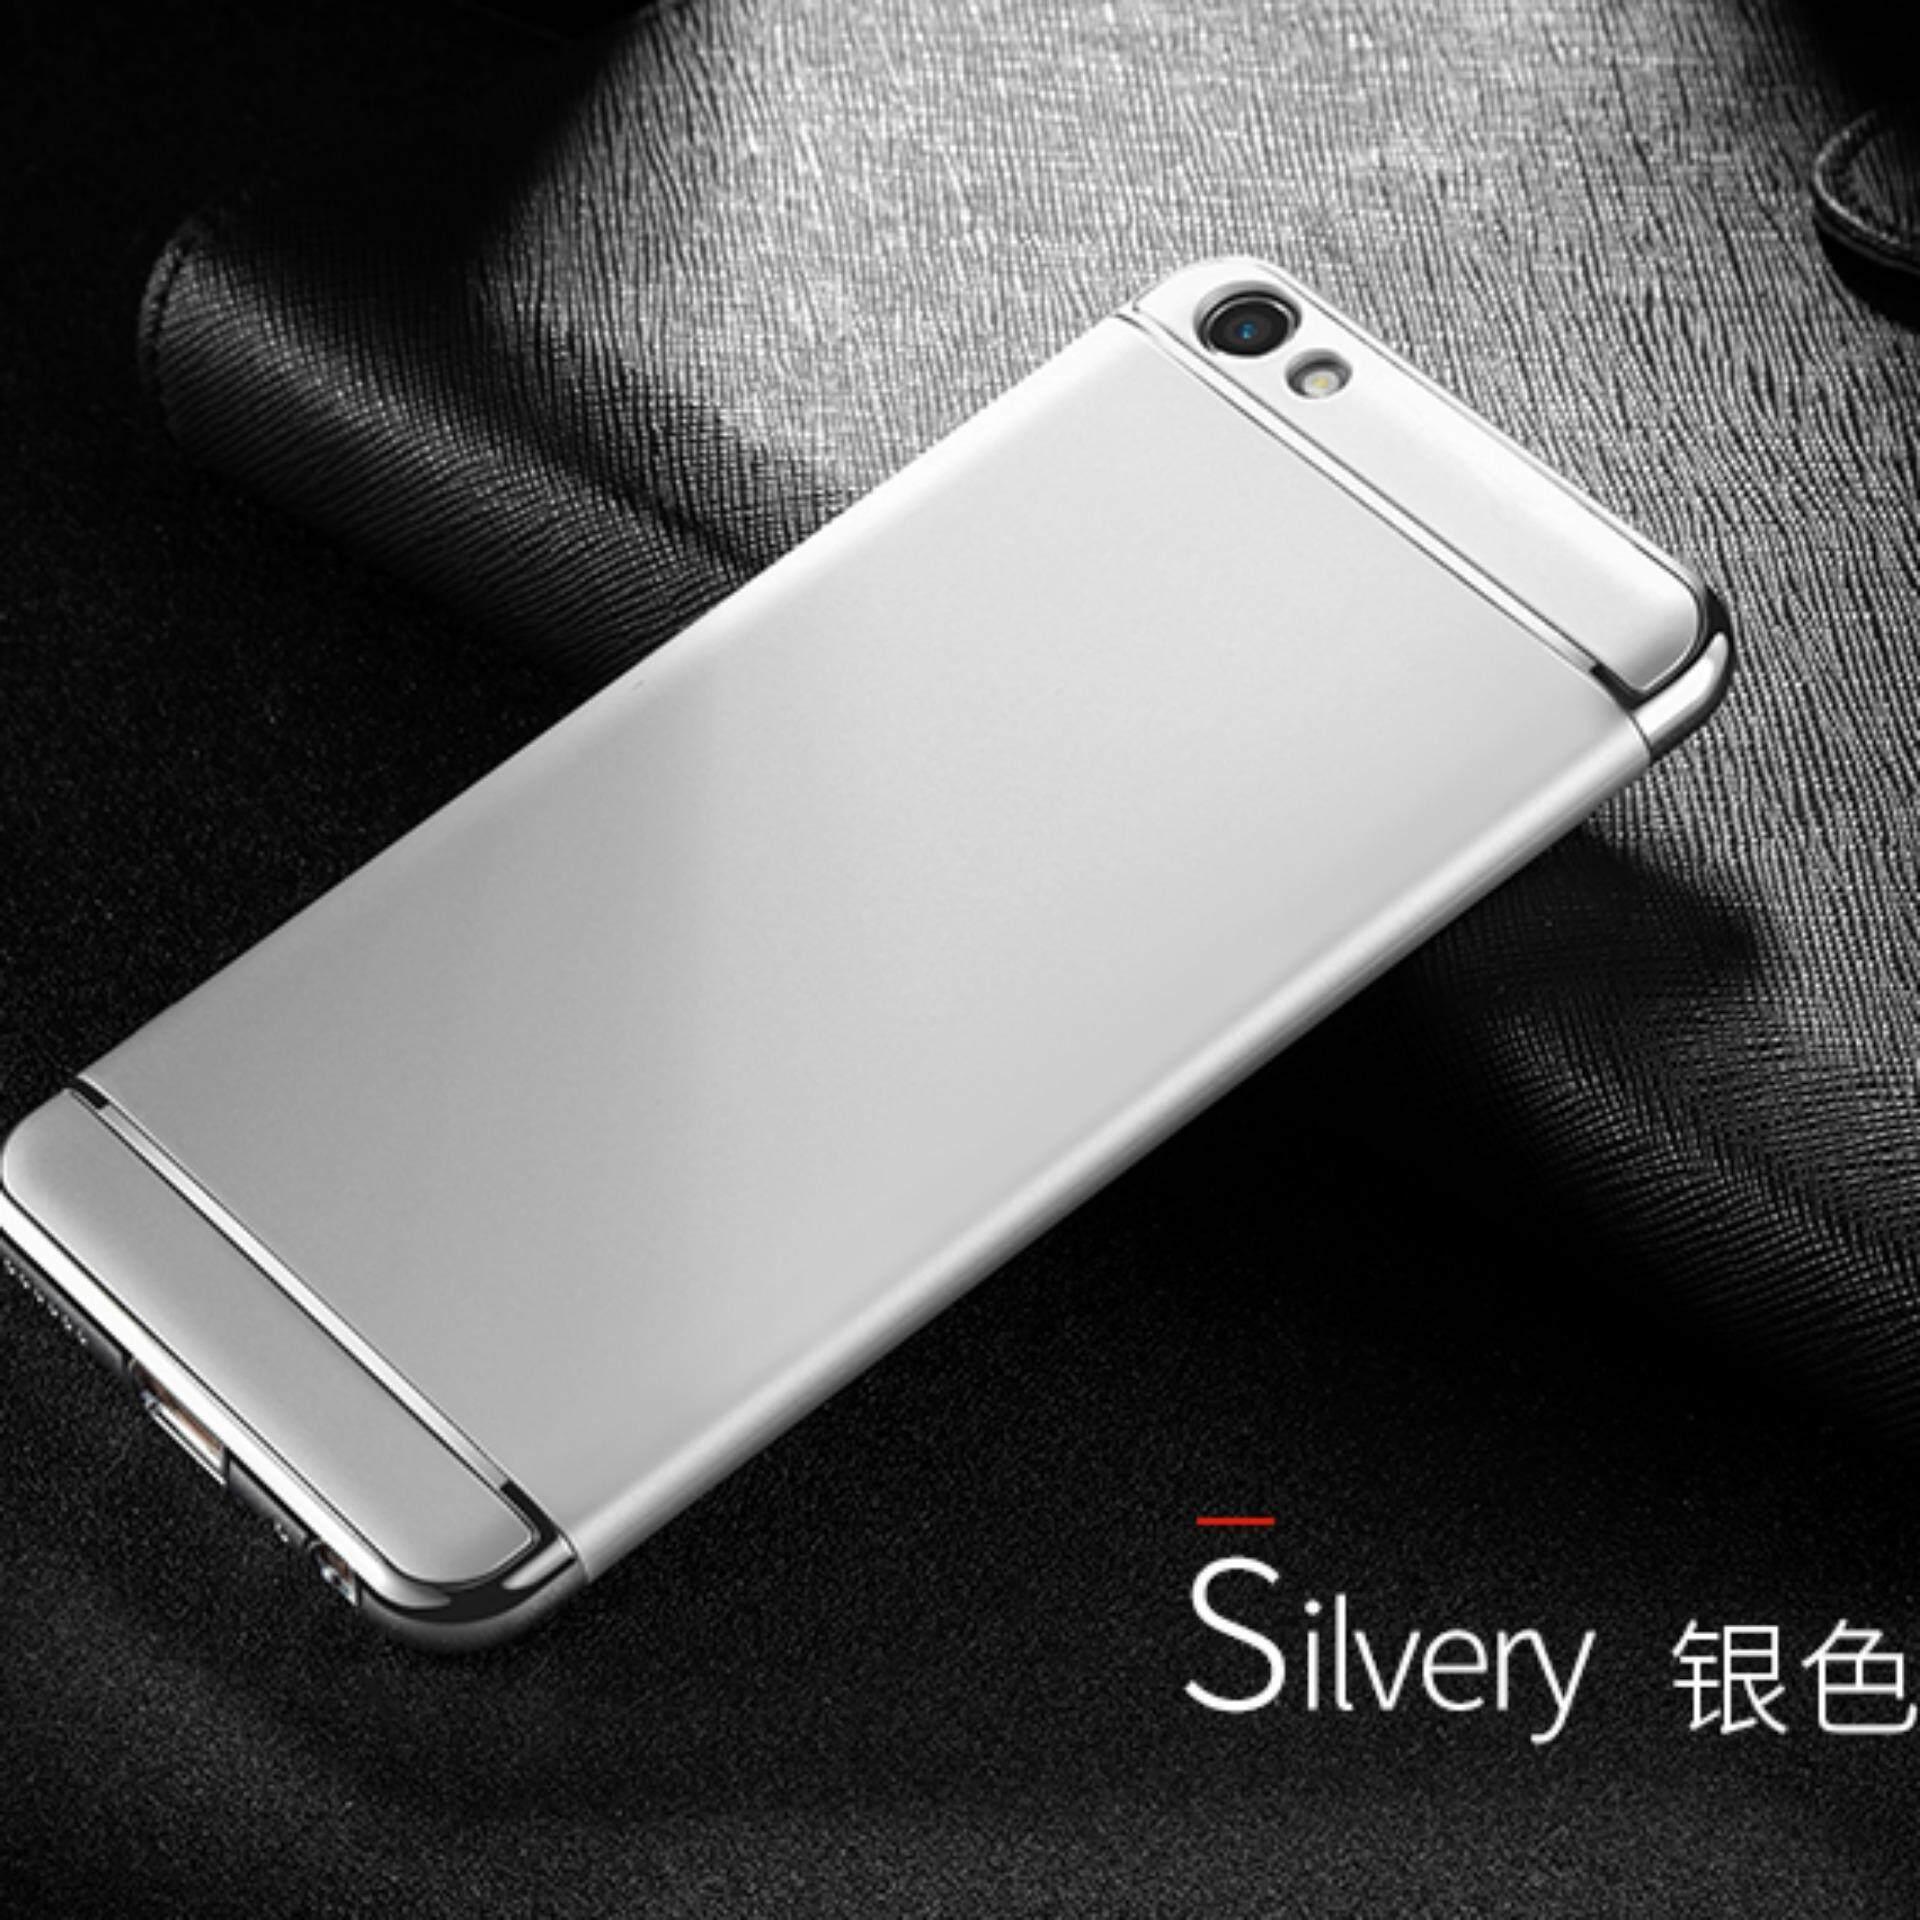 360 Pc Case Cover For Oppo A37blue Intl Daftar Harga Terkini dan Source · LongTeng 3 trong 1 c i B o V M t Sau p L ng Cho Vivo X7